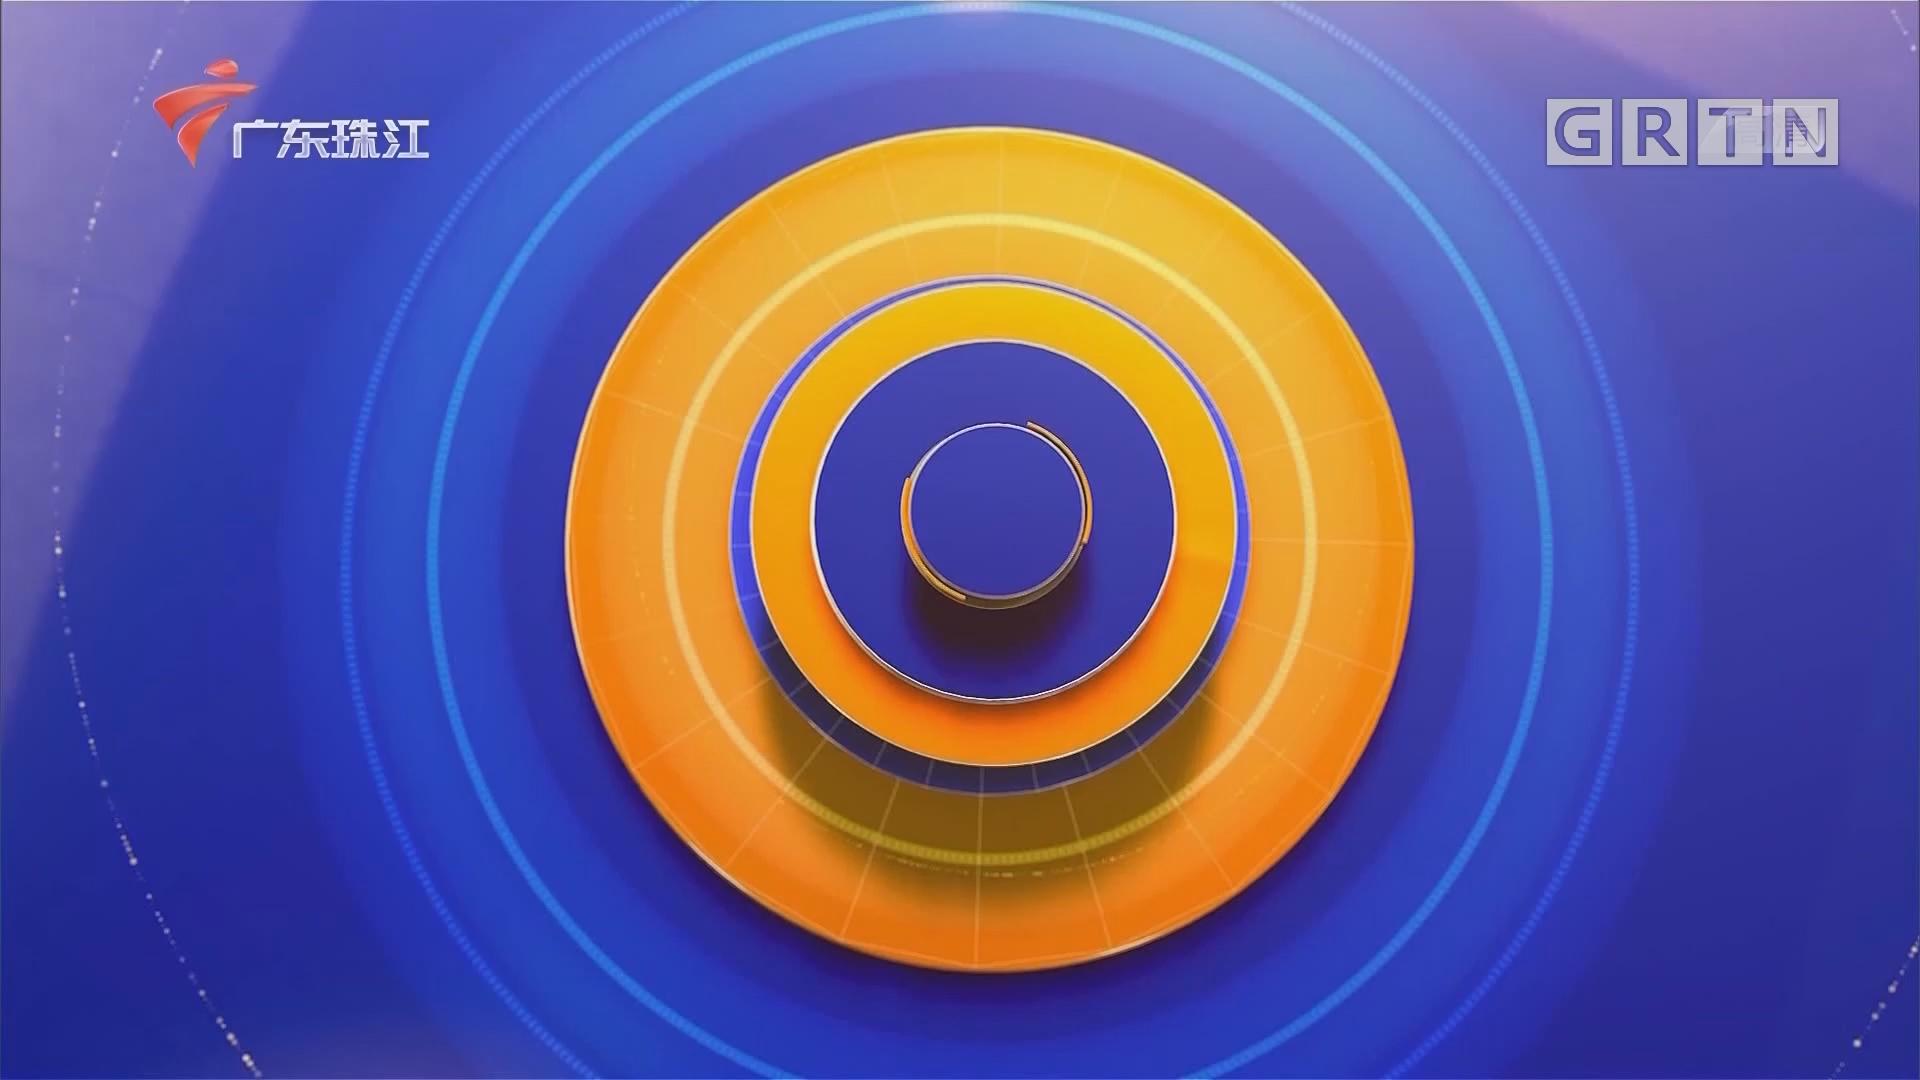 [HD][2020-02-18]今日财经:广深港澳科技创新走廊——聚能湾区 连接世界